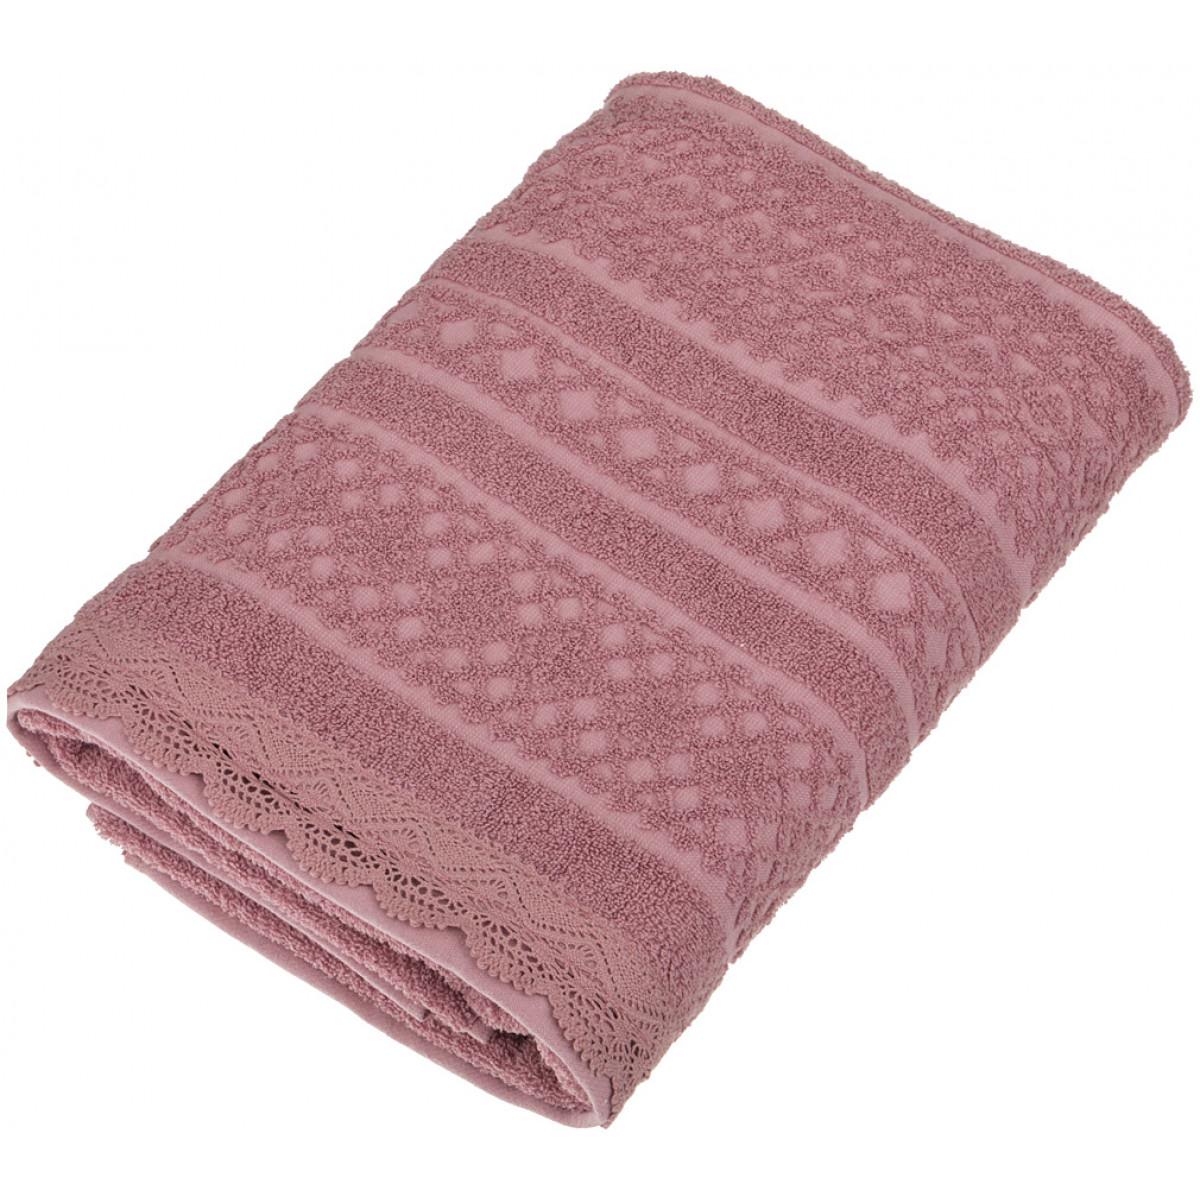 Полотенца Santalino Полотенце Dodie  (50х90 см) bizet полотенце 50 90 см 971252